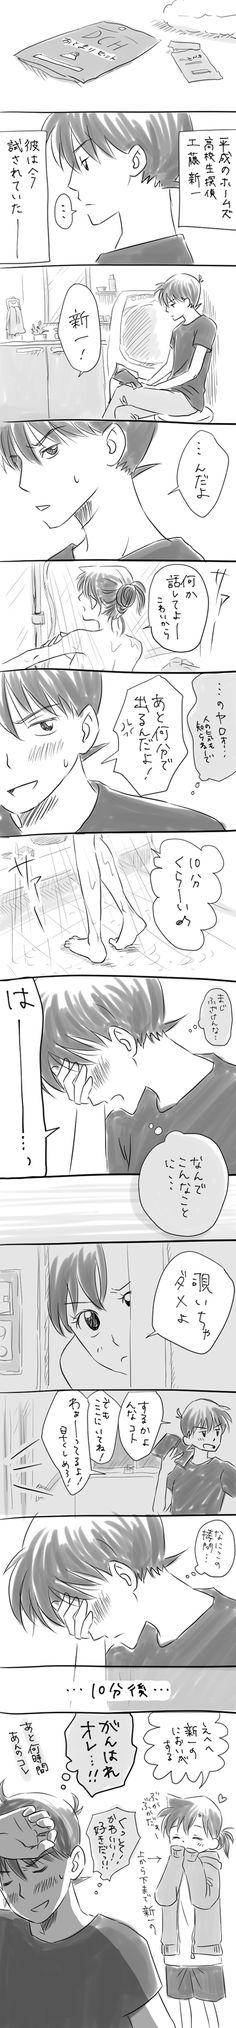 Detective Conan Wallpapers, Kudo Shinichi, Case Closed, Steven Universe, Memes, Anime, Manga Drawing, Meme, Cartoon Movies